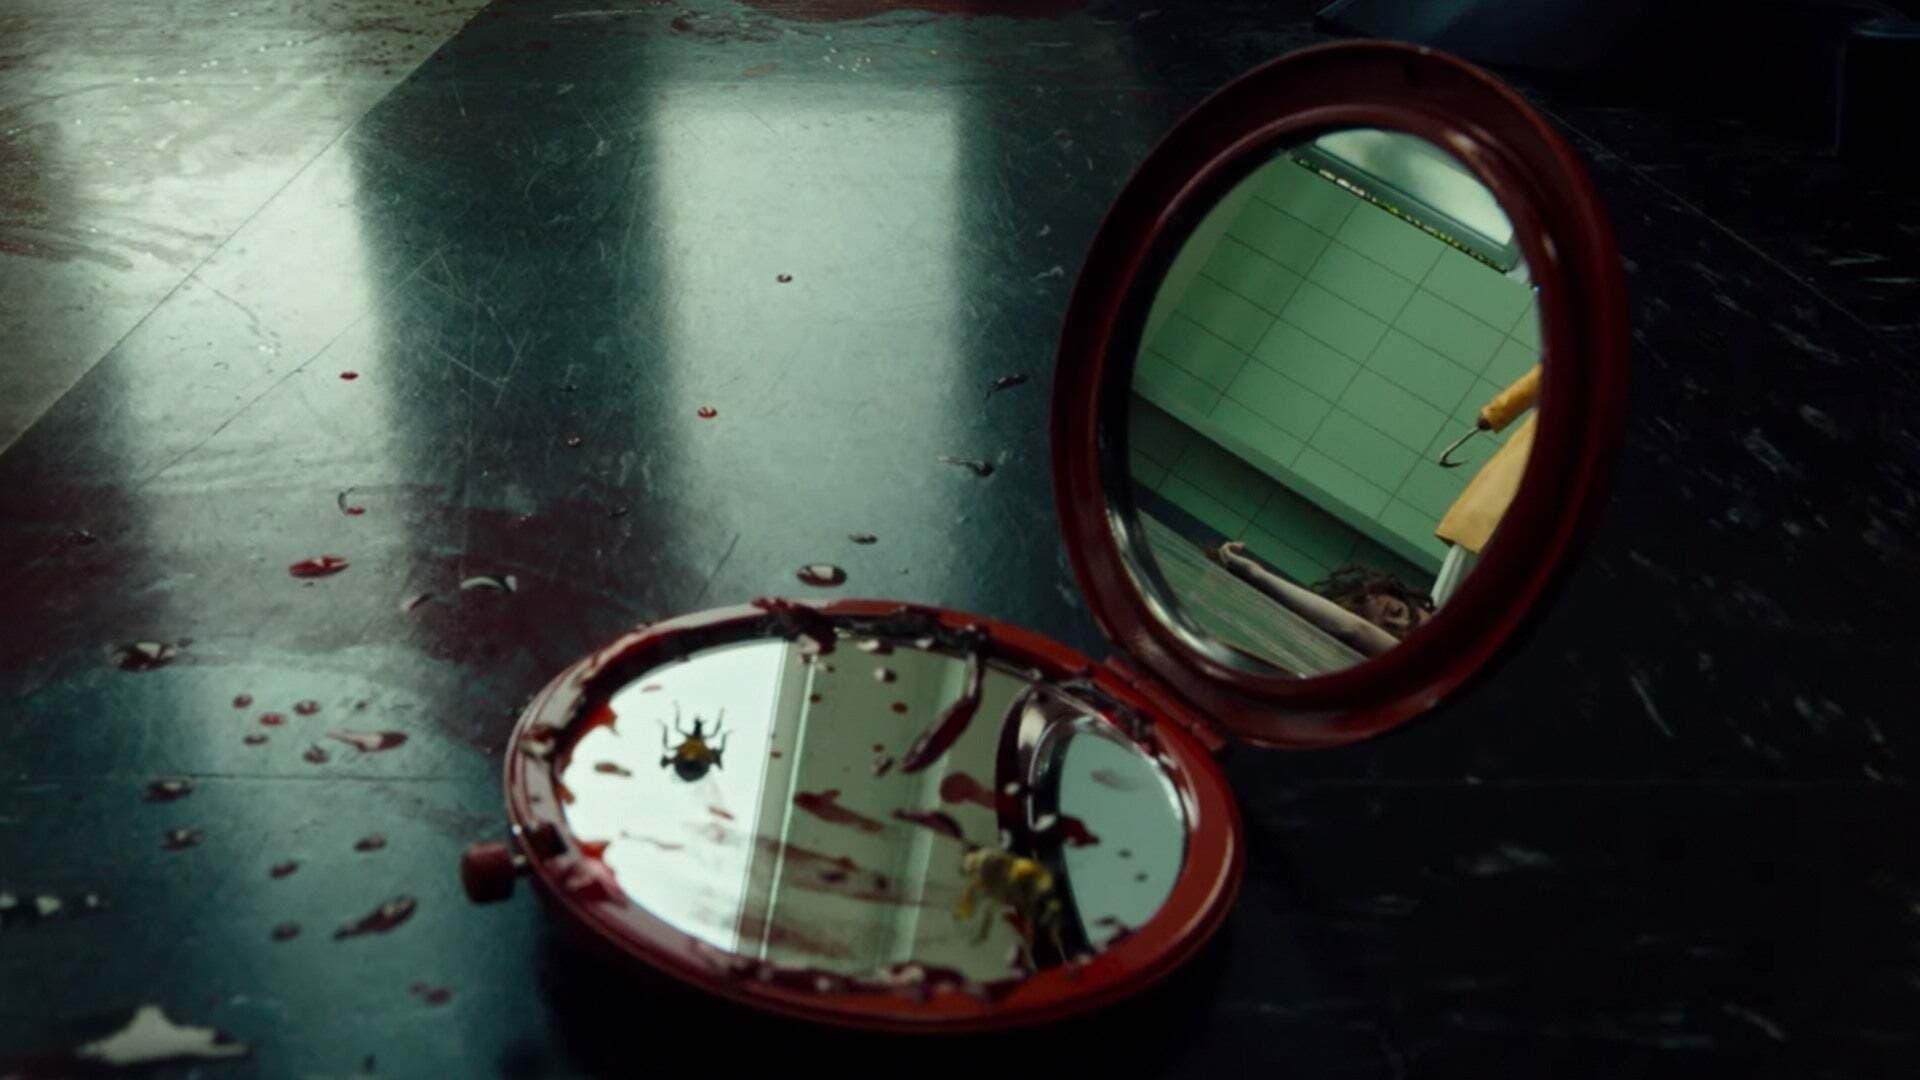 Jordan Peele Candyman 2021 killing college girls in bathroom